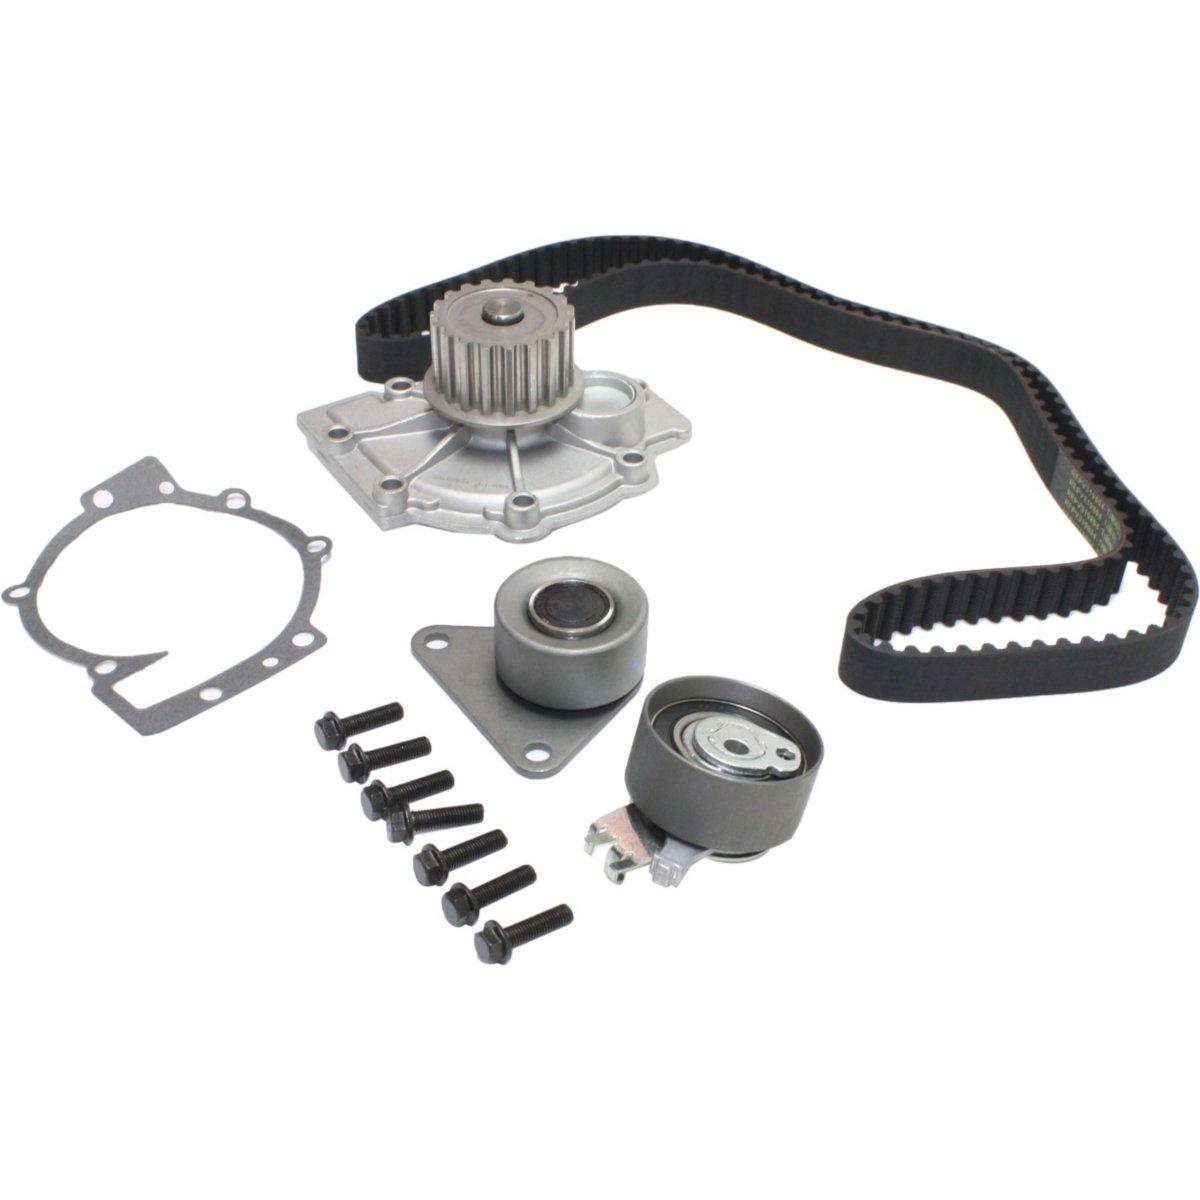 new timing belt kit volvo v70 s40 s80 s60 xc90 s70 xc70 ... volvo timing belt timing belt diagram 3 2 volvo